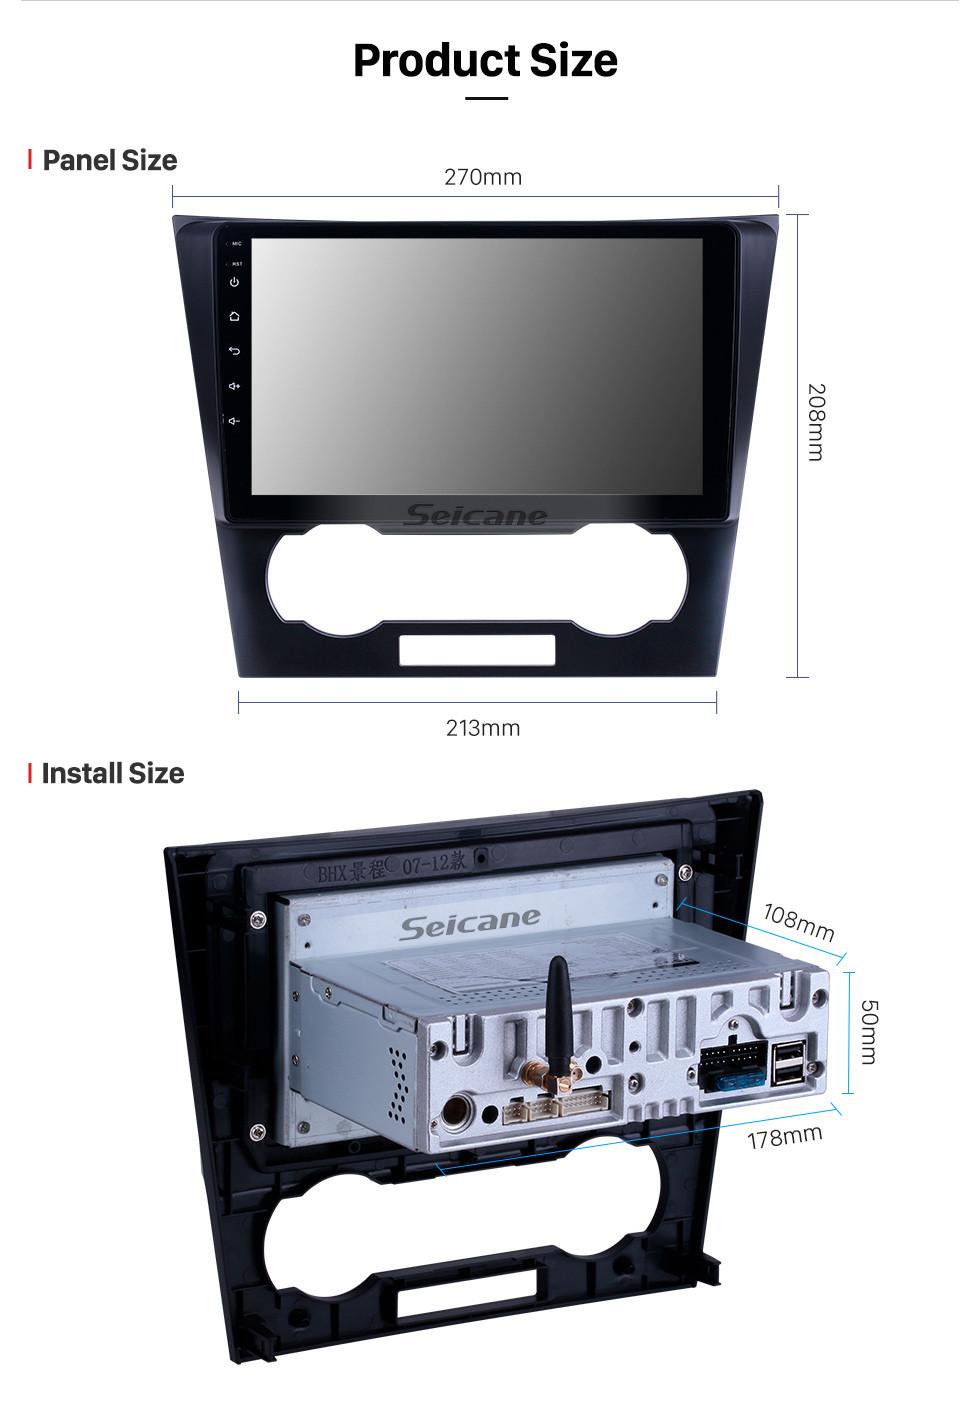 Seicane 2007-2012 Chevy Chevrolet Epica Android 9.0 9-дюймовый GPS-навигация Радио Bluetooth HD Сенсорный экран USB Поддержка Carplay DAB + SWC